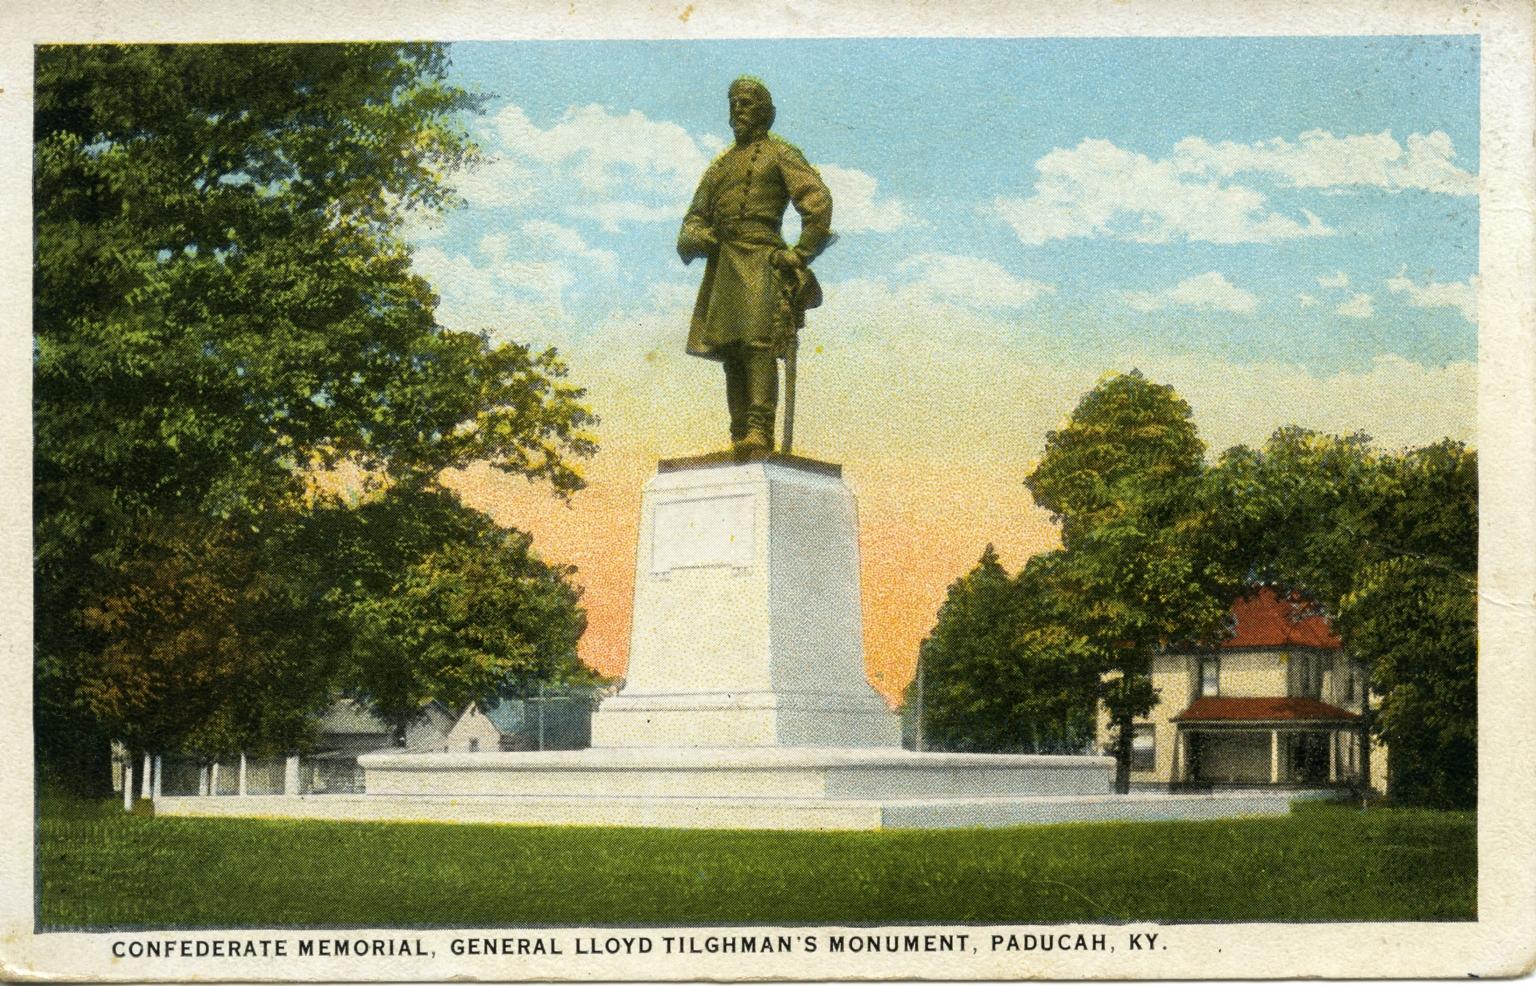 General Lloyd Tilghman Monument